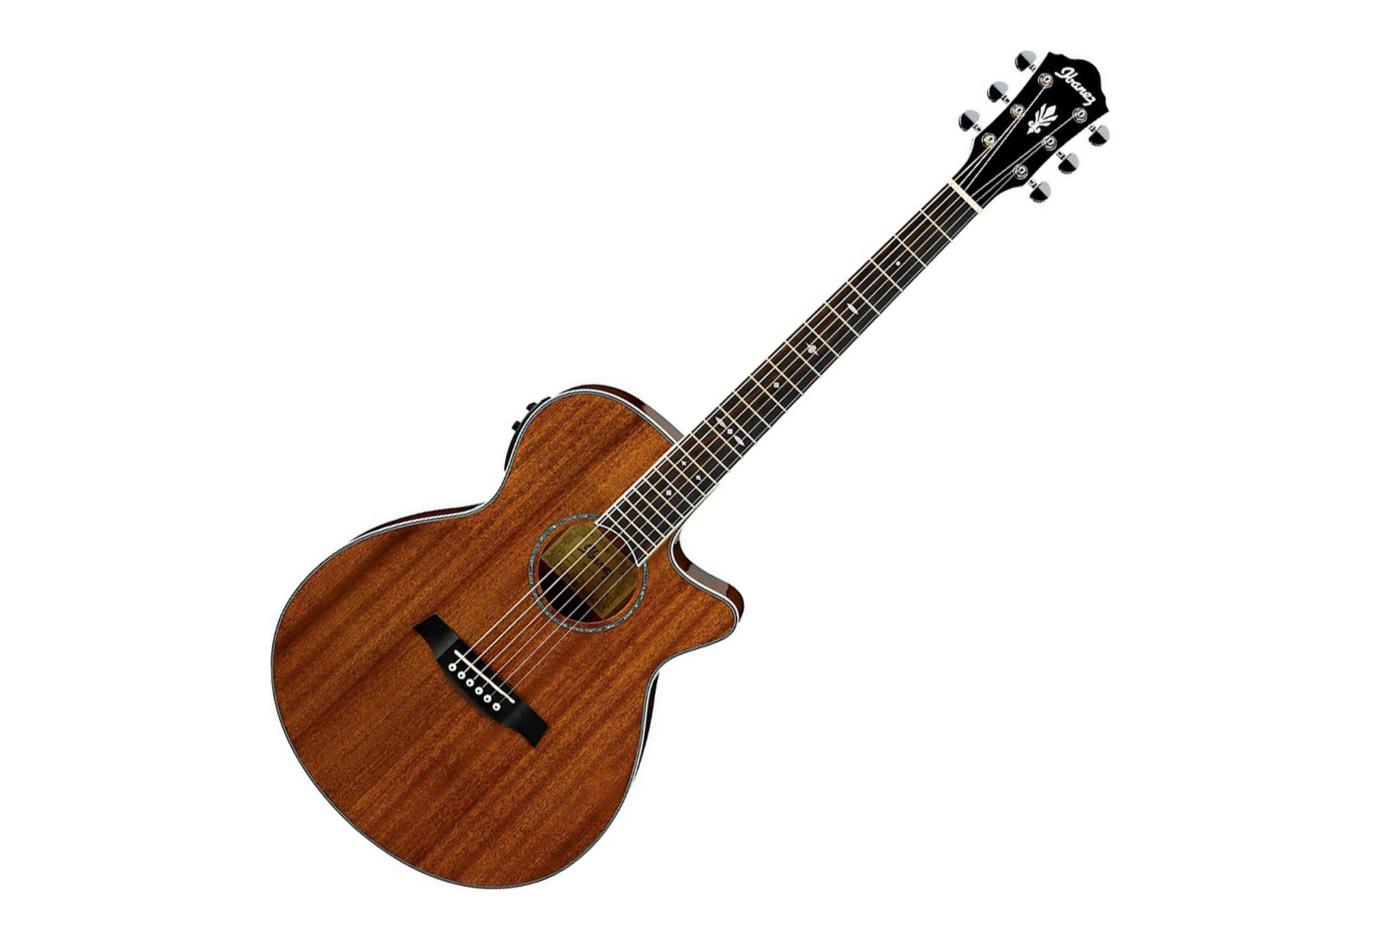 ibanez aeg12ii aeg acoustic electric guitar. Black Bedroom Furniture Sets. Home Design Ideas